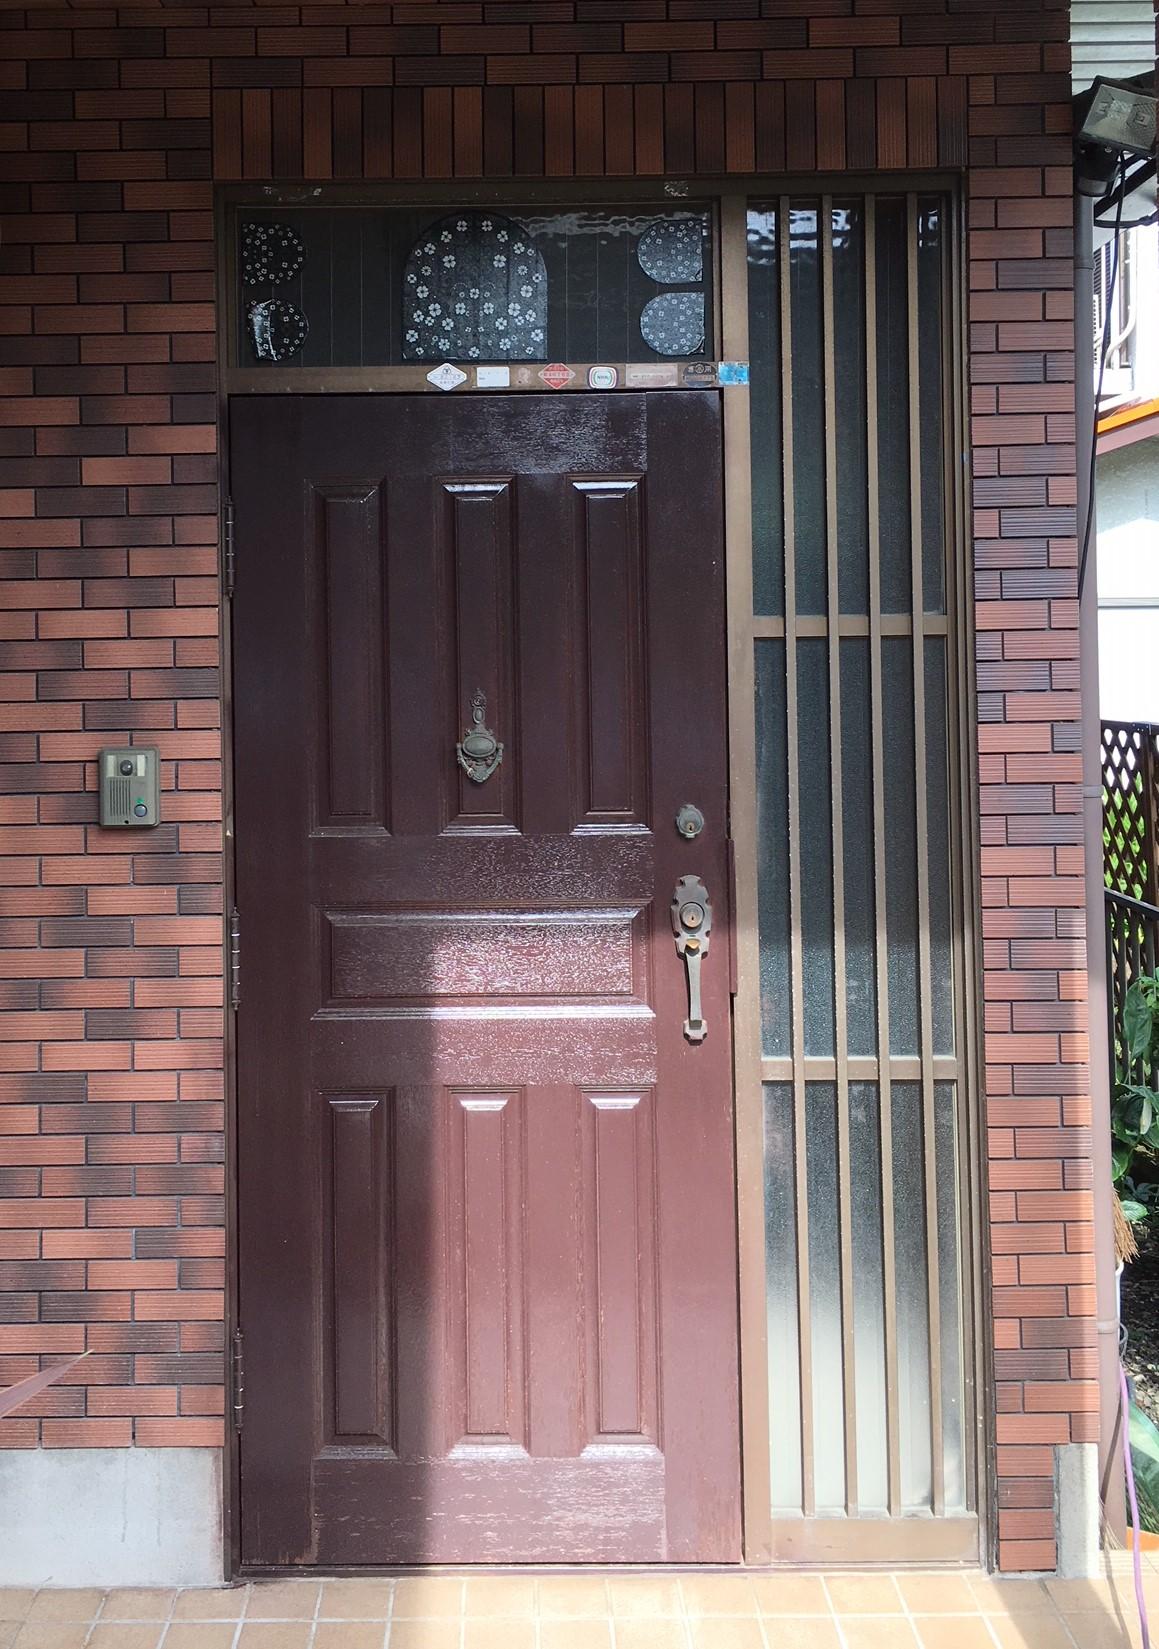 S様邸玄関ドアリフォーム施工後